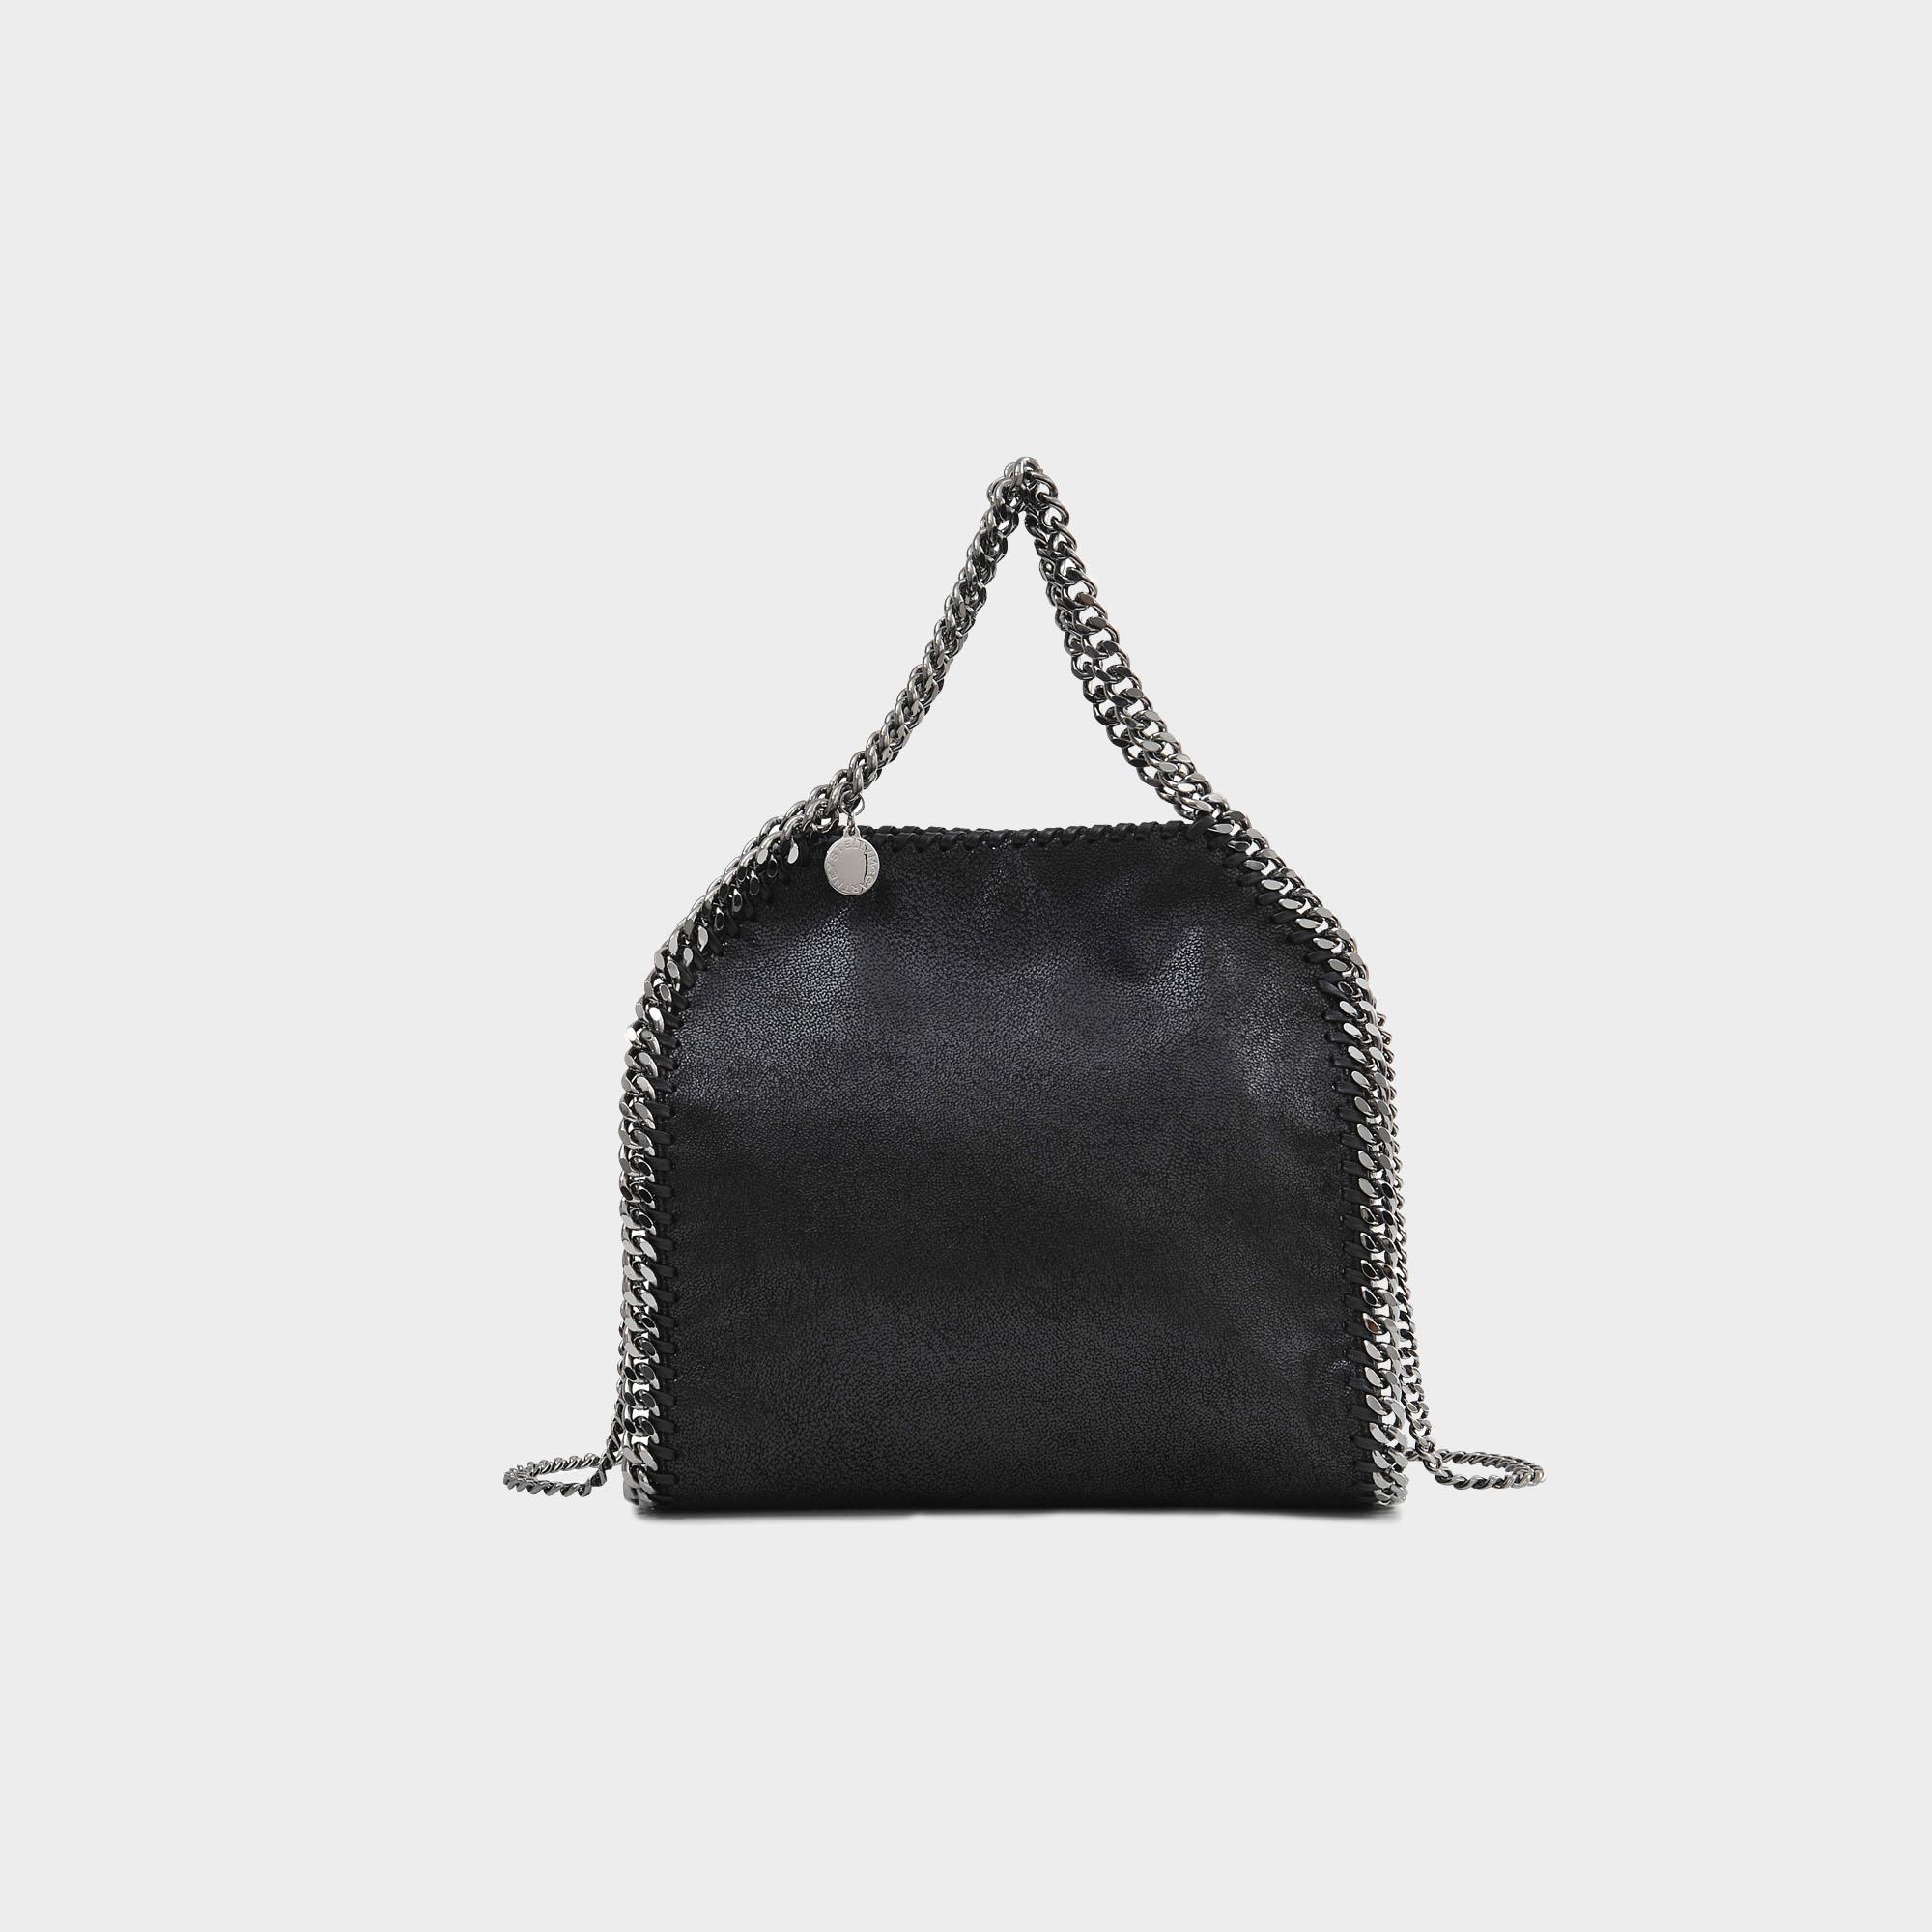 cd81704b2bd0 Stella Mccartney Minibella Tote Silver Chain Bag In Black Eco ...